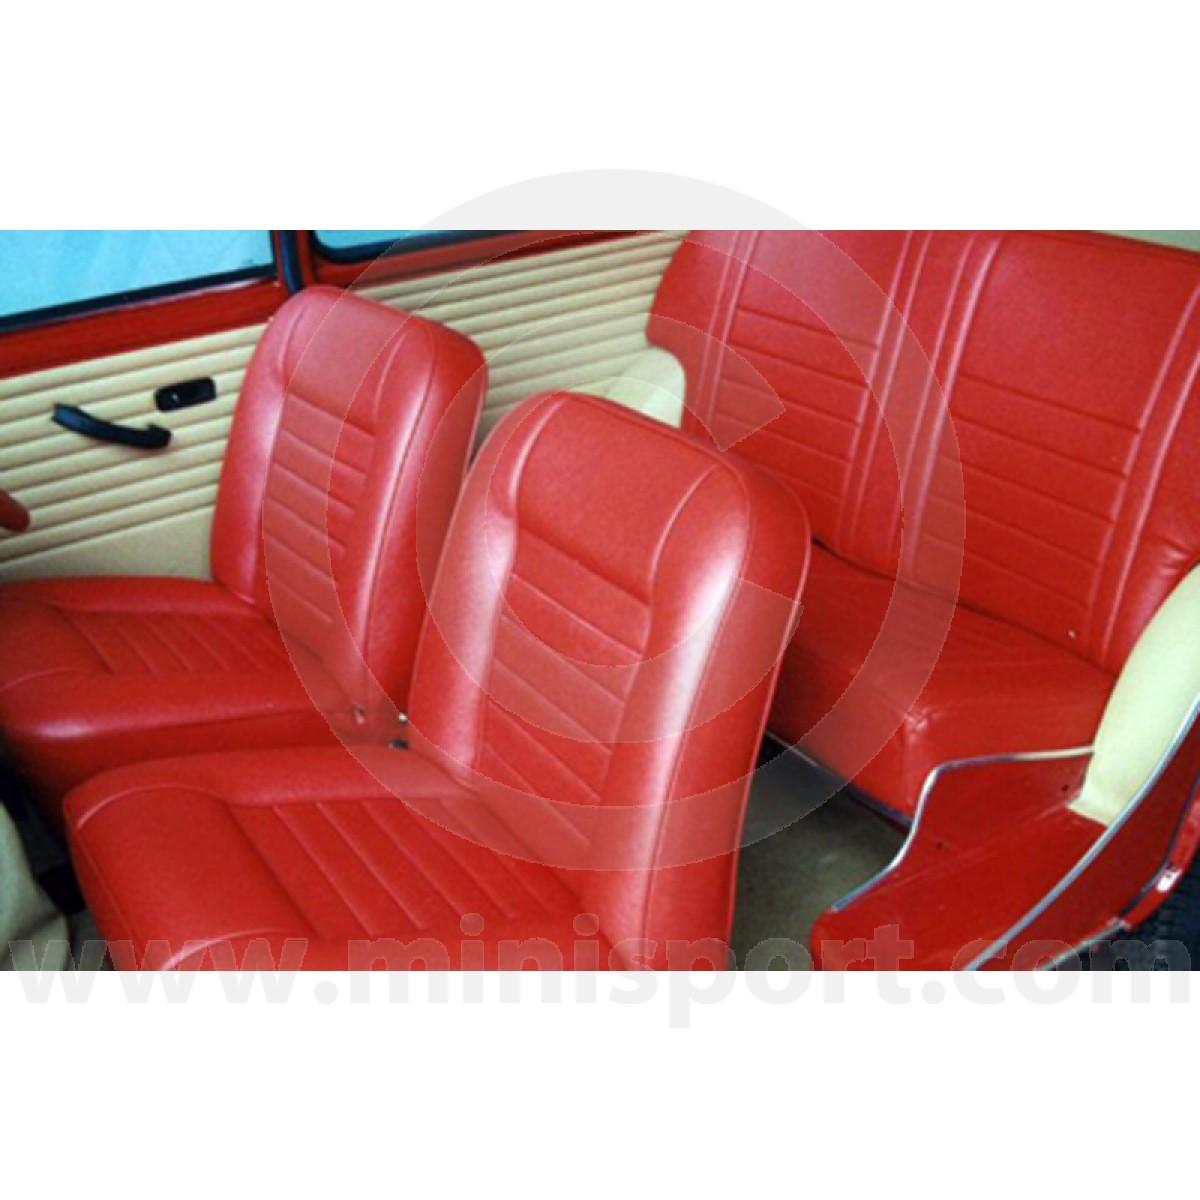 Sc3270 Mini Seat Covers Interior Trim Sport Mk1 Golf Starter Motor Wiring Diagram Front Rear Cover Kit Saloons 1973 75